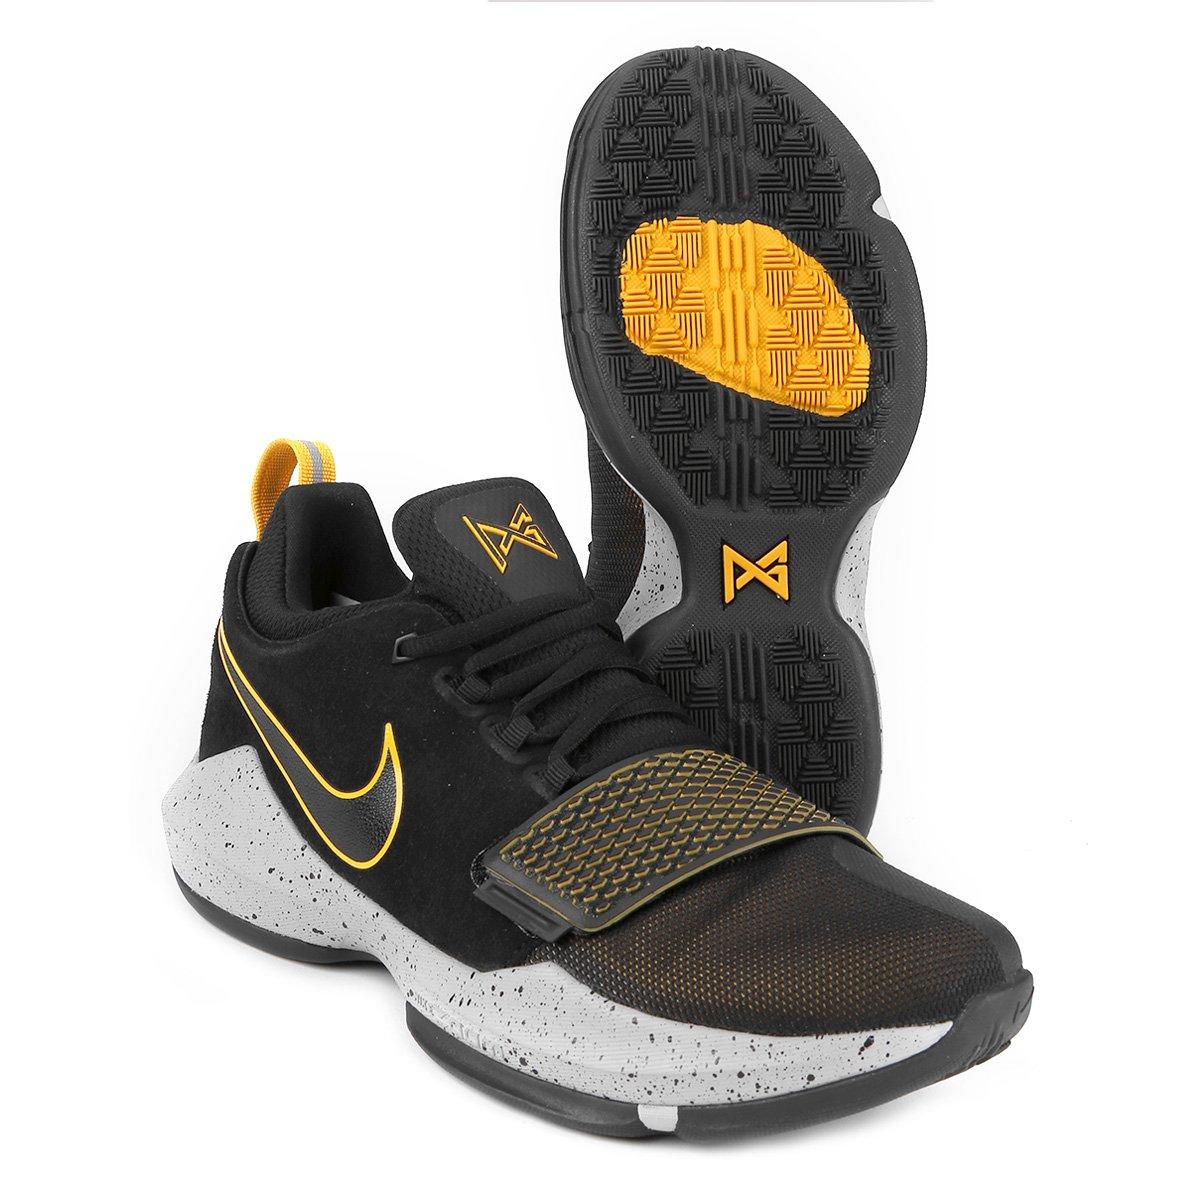 7ae88d65e20 Tênis Nike Paul George Masculino - Compre Agora